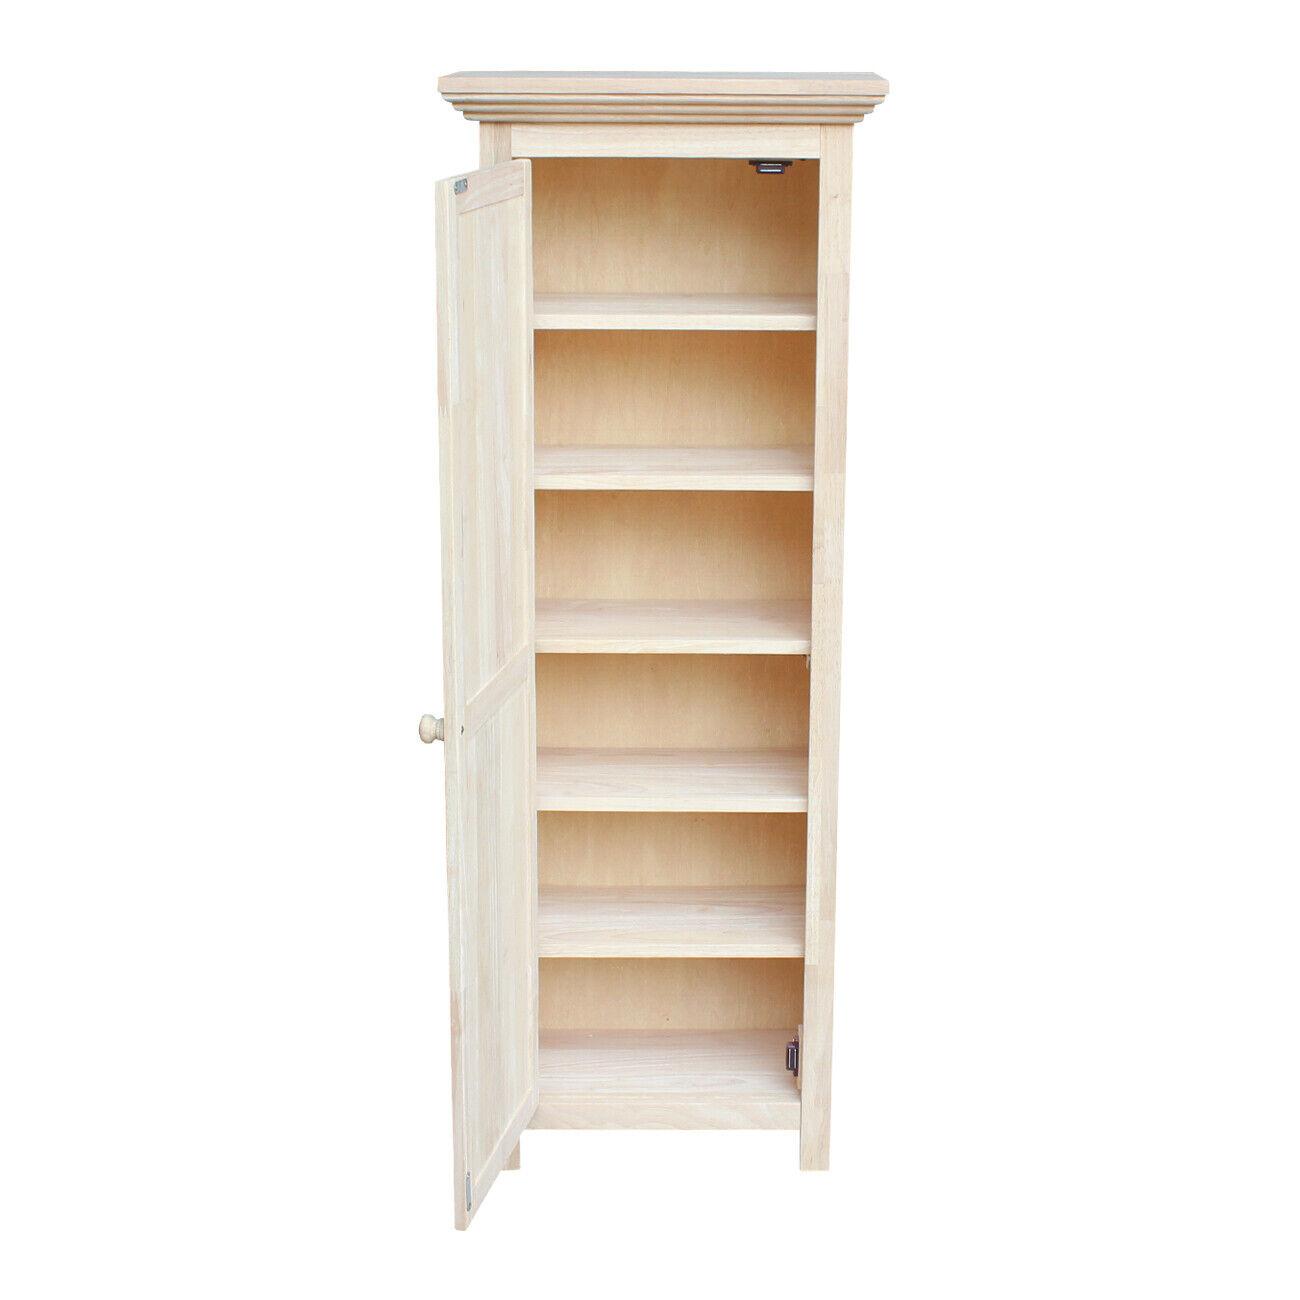 storage cabinet cupboard pantry kitchen bedroom utility